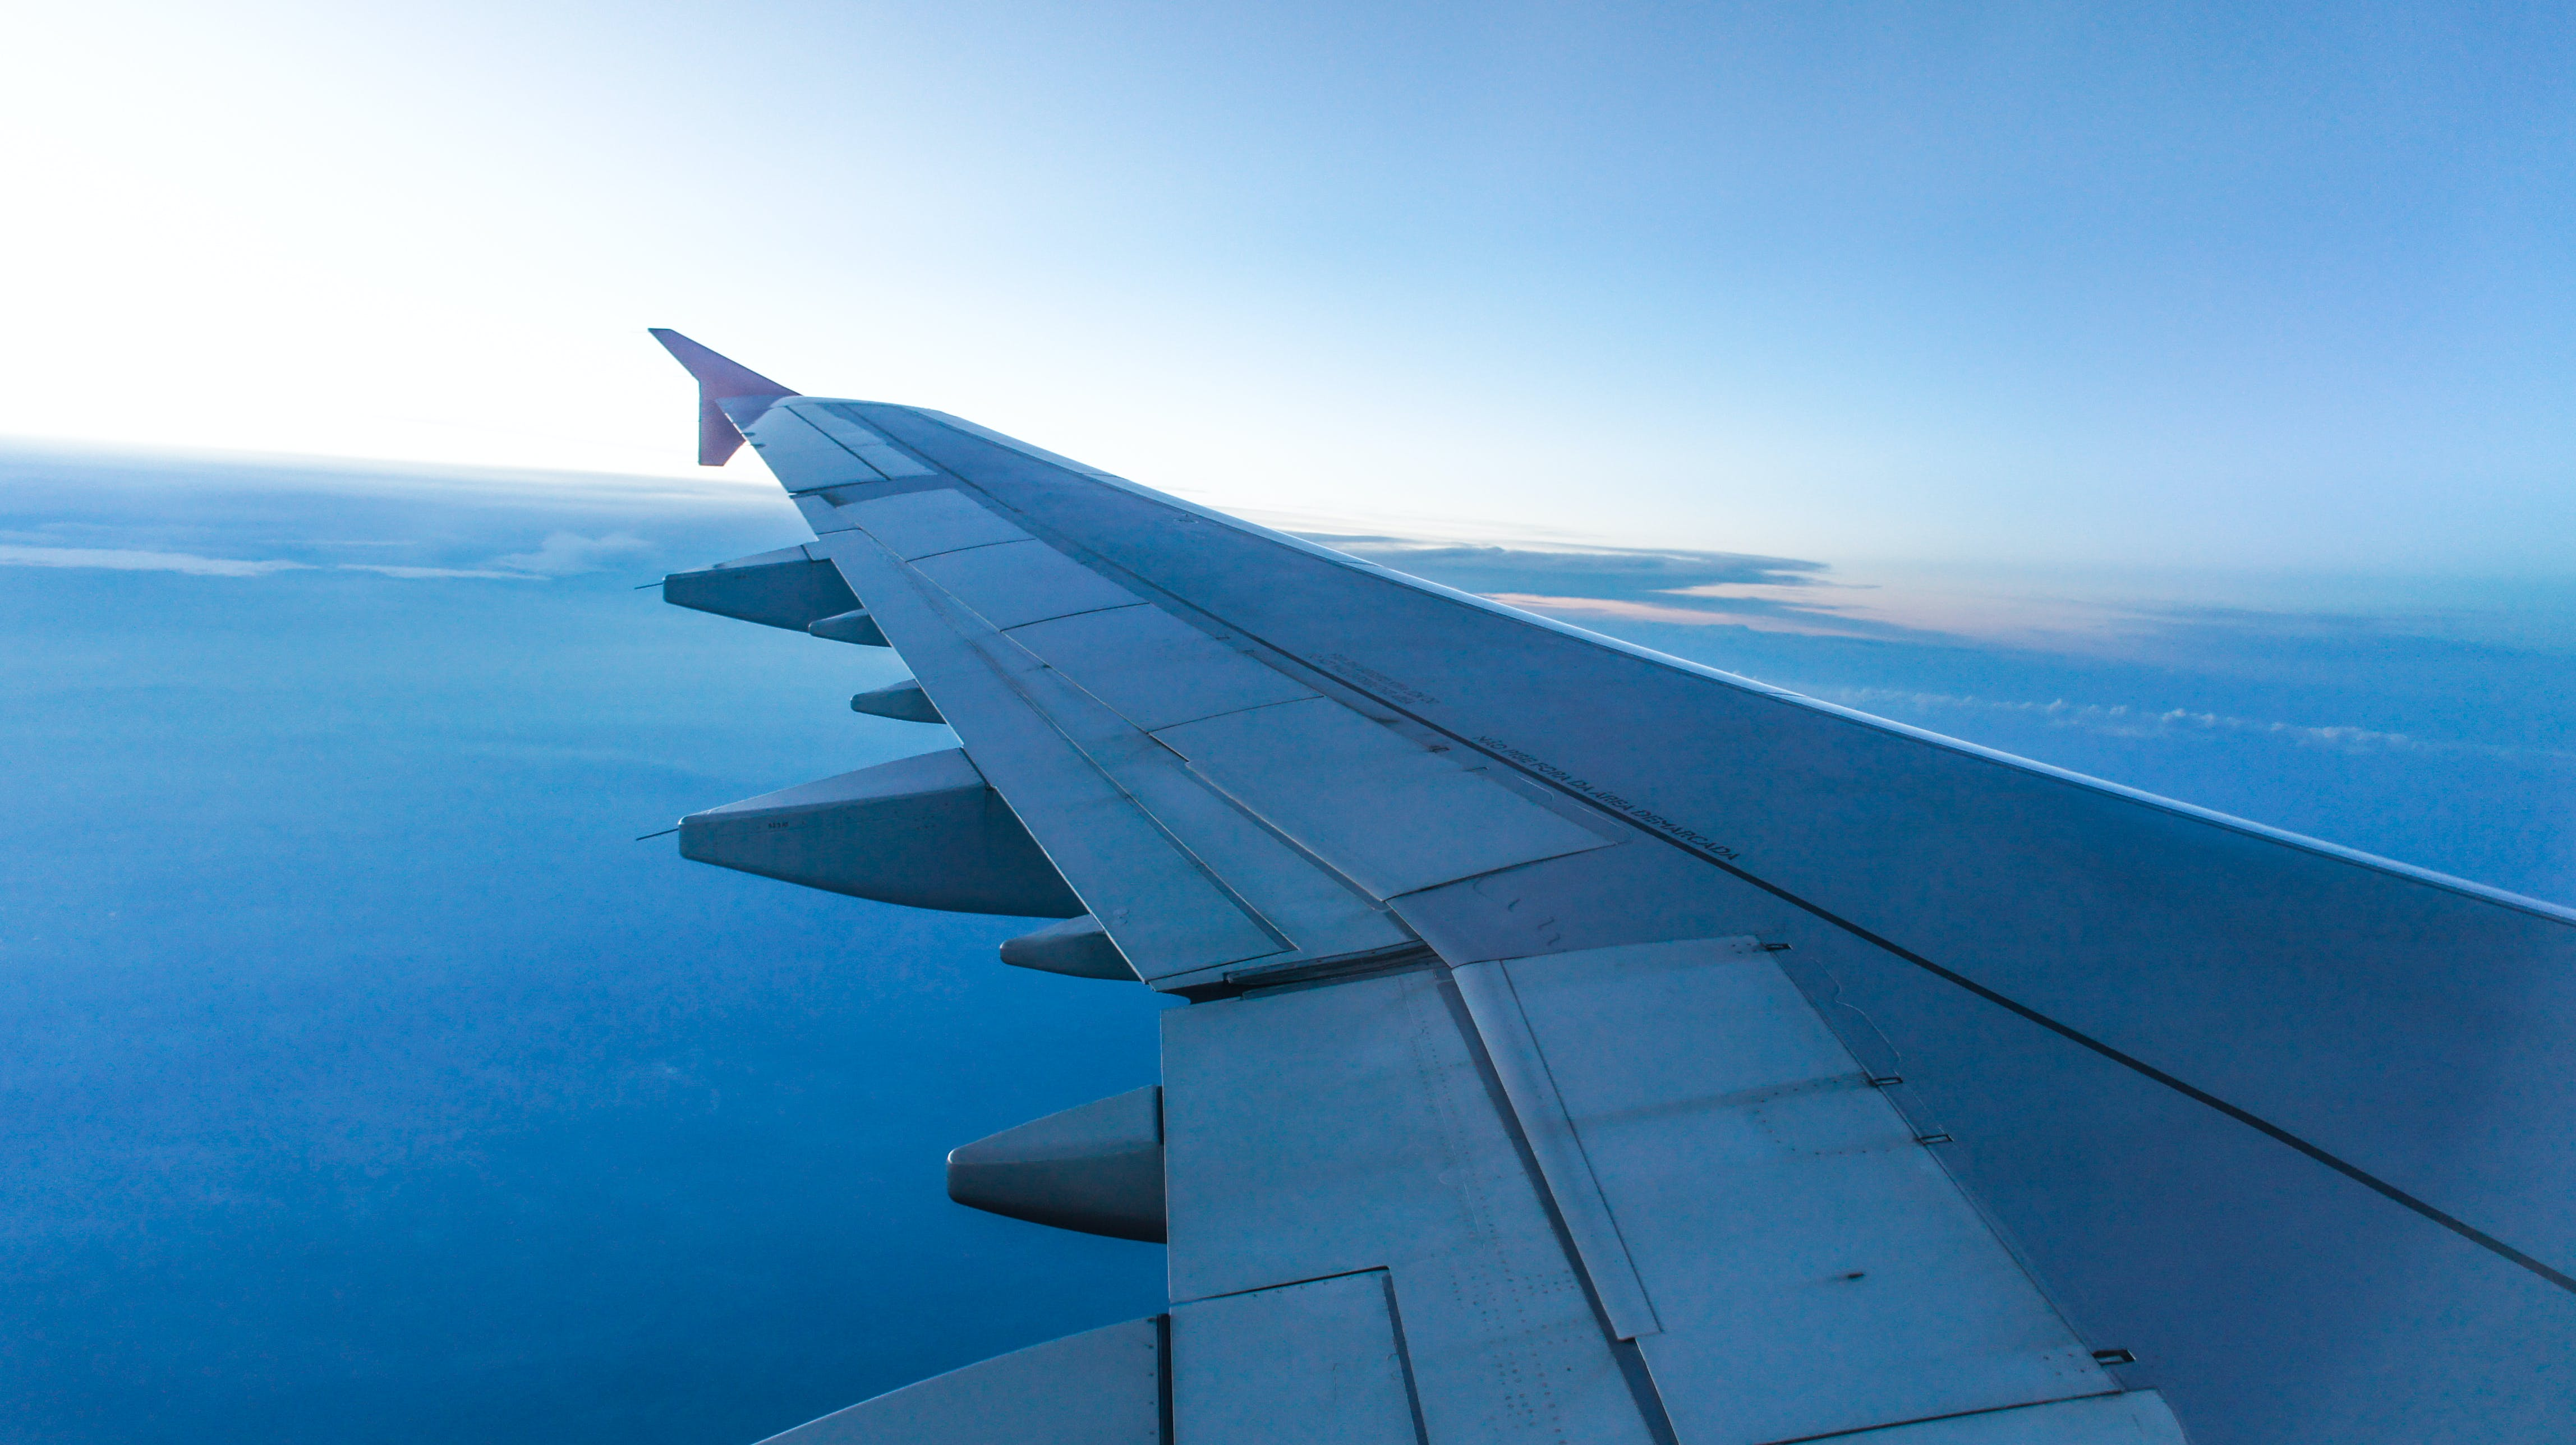 Free stock photo of aeroplane, blue skies, blue sky, fly